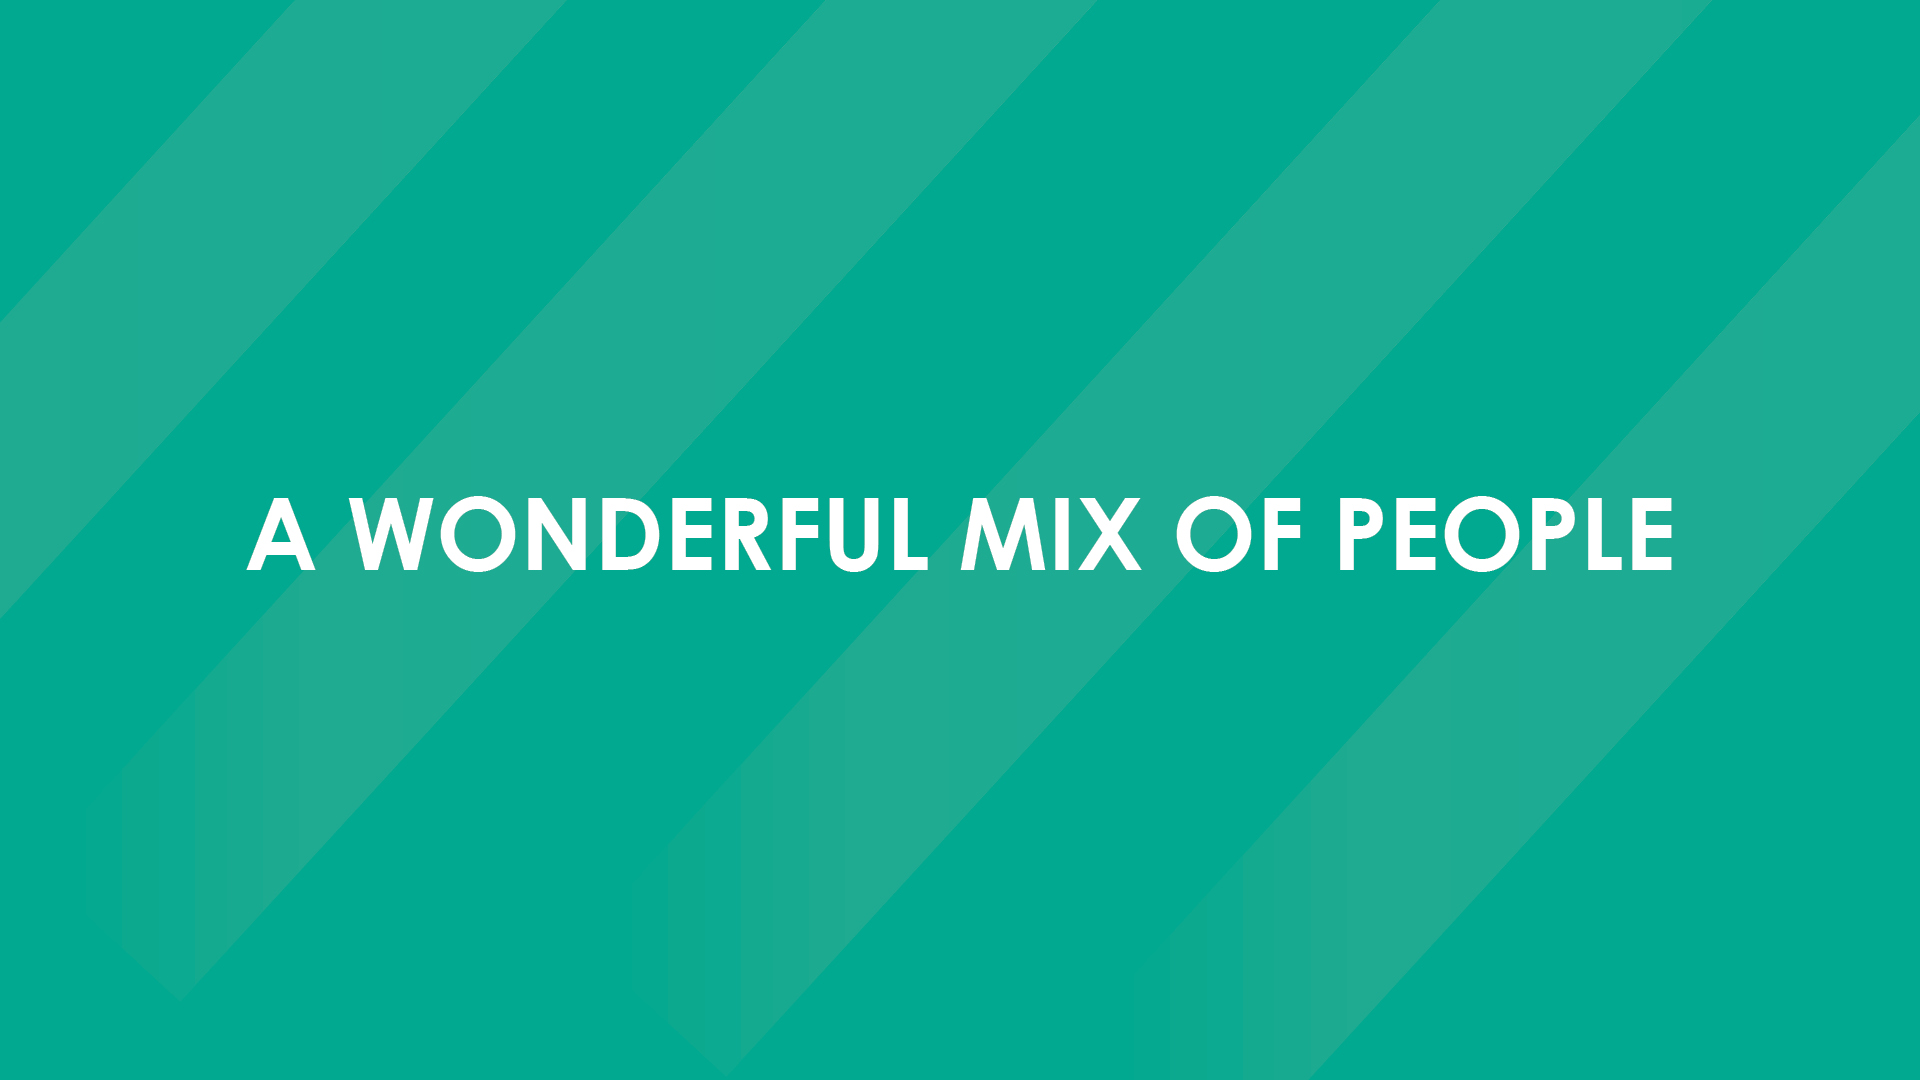 A wonderful mix of people.jpg